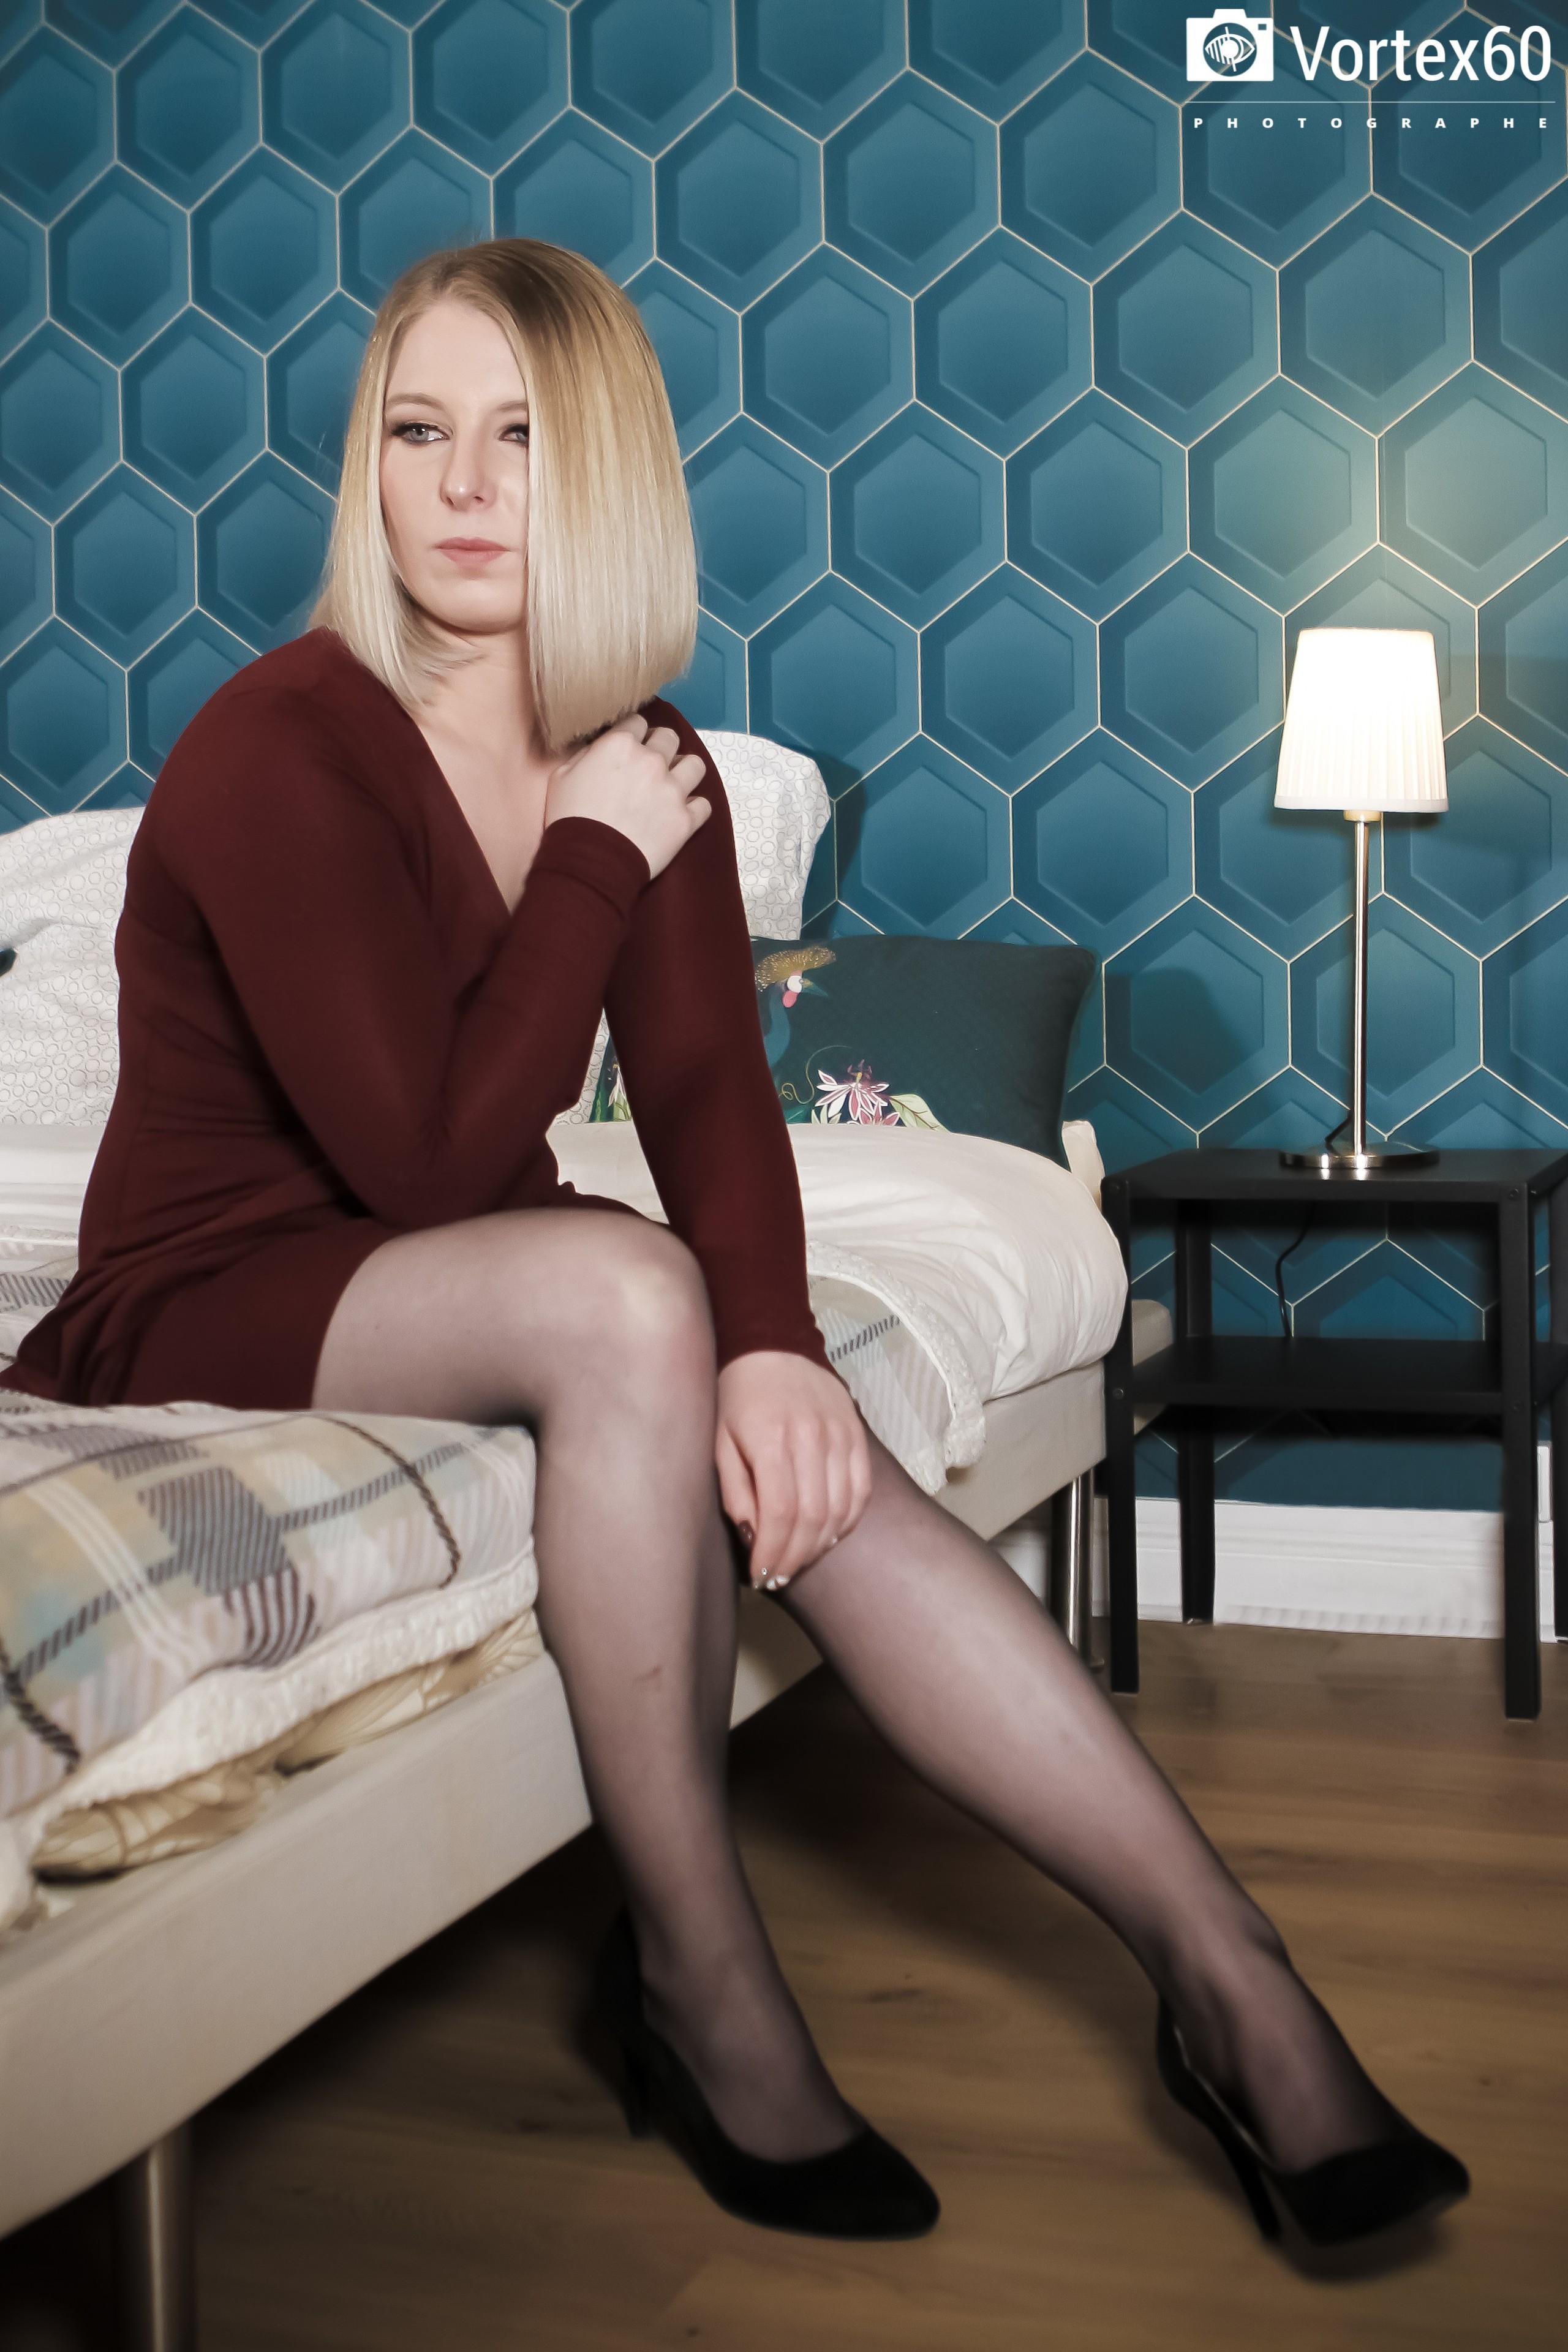 At Home - Jennifer .B  by Vortex60 Photographe